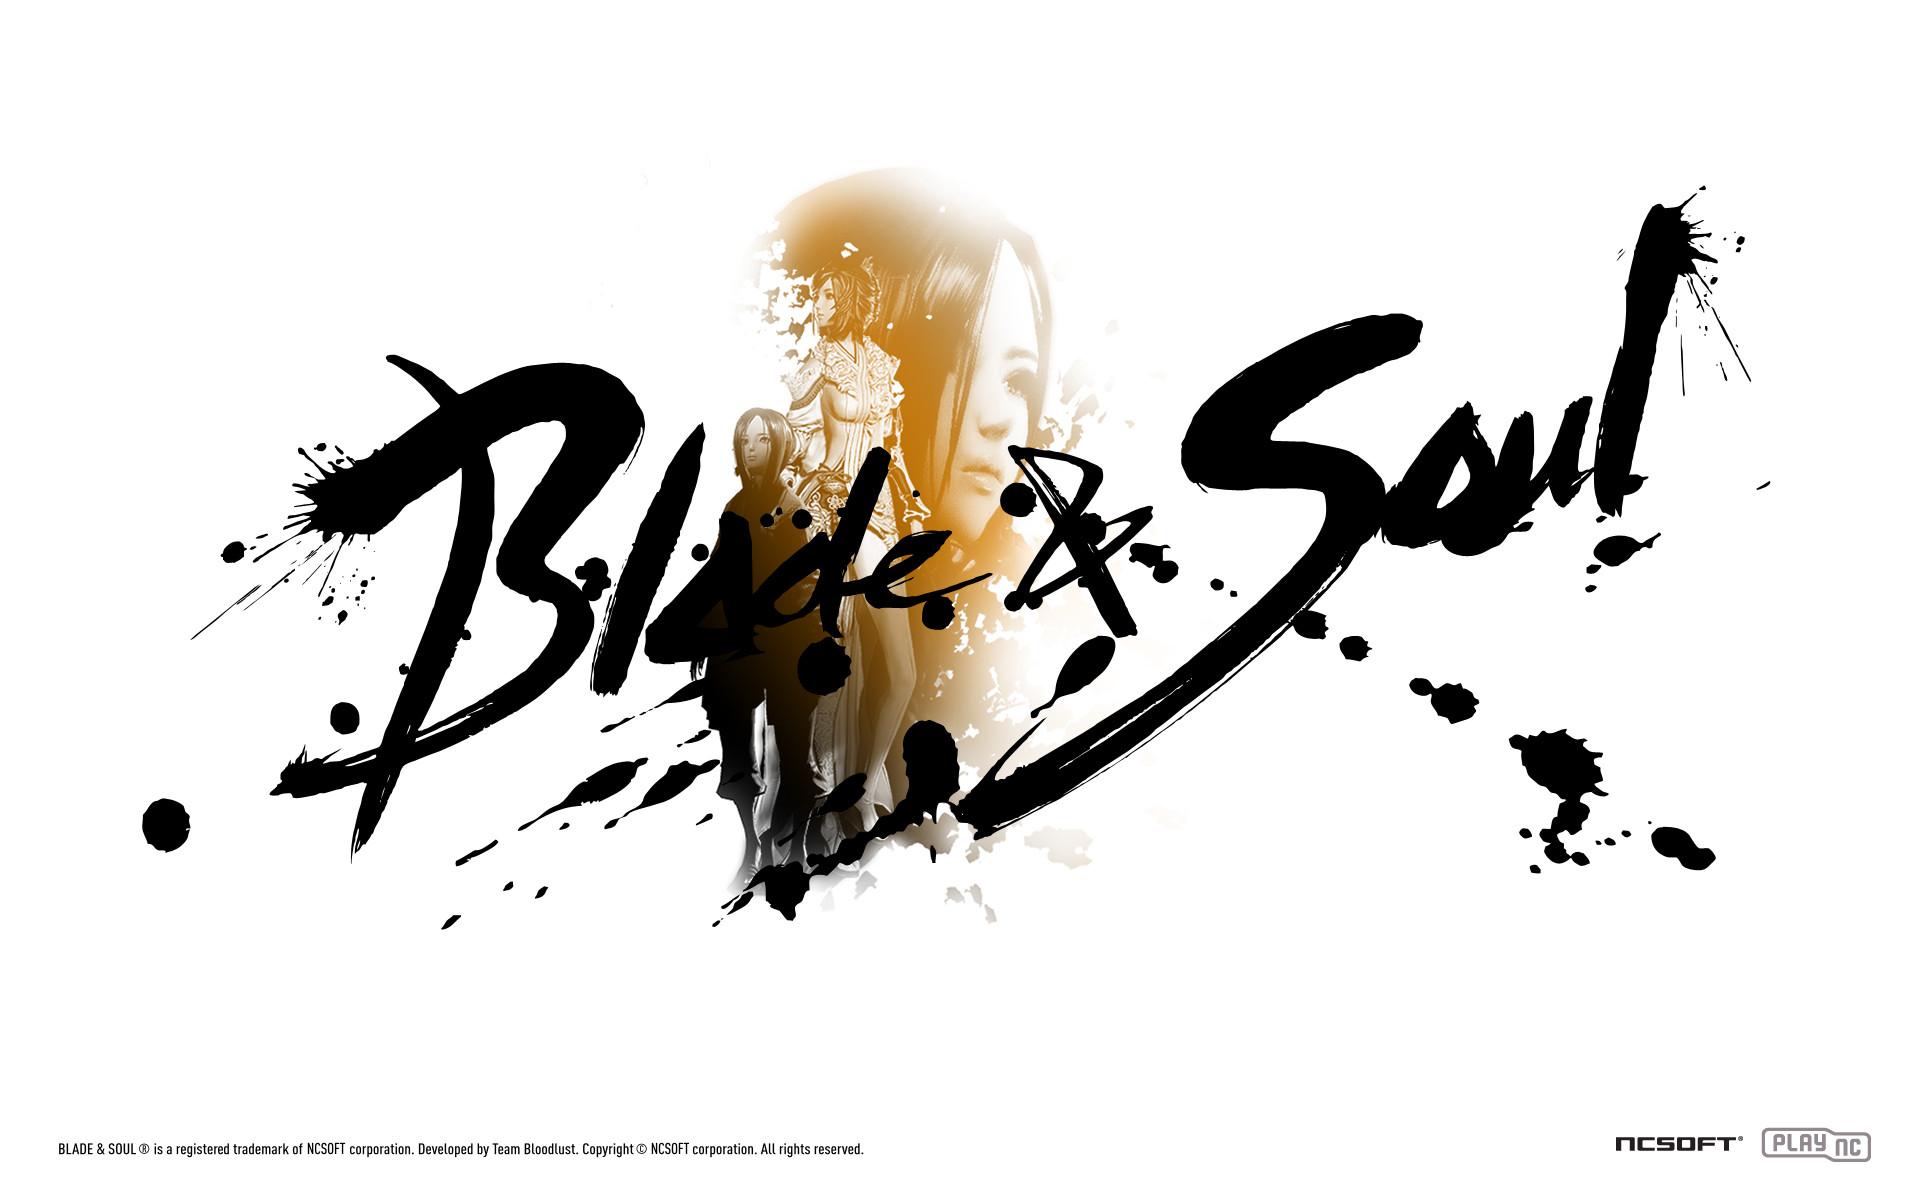 08O7Q6B322O4. 09pKEXH4031Q. Advertisements. Blade & Soul